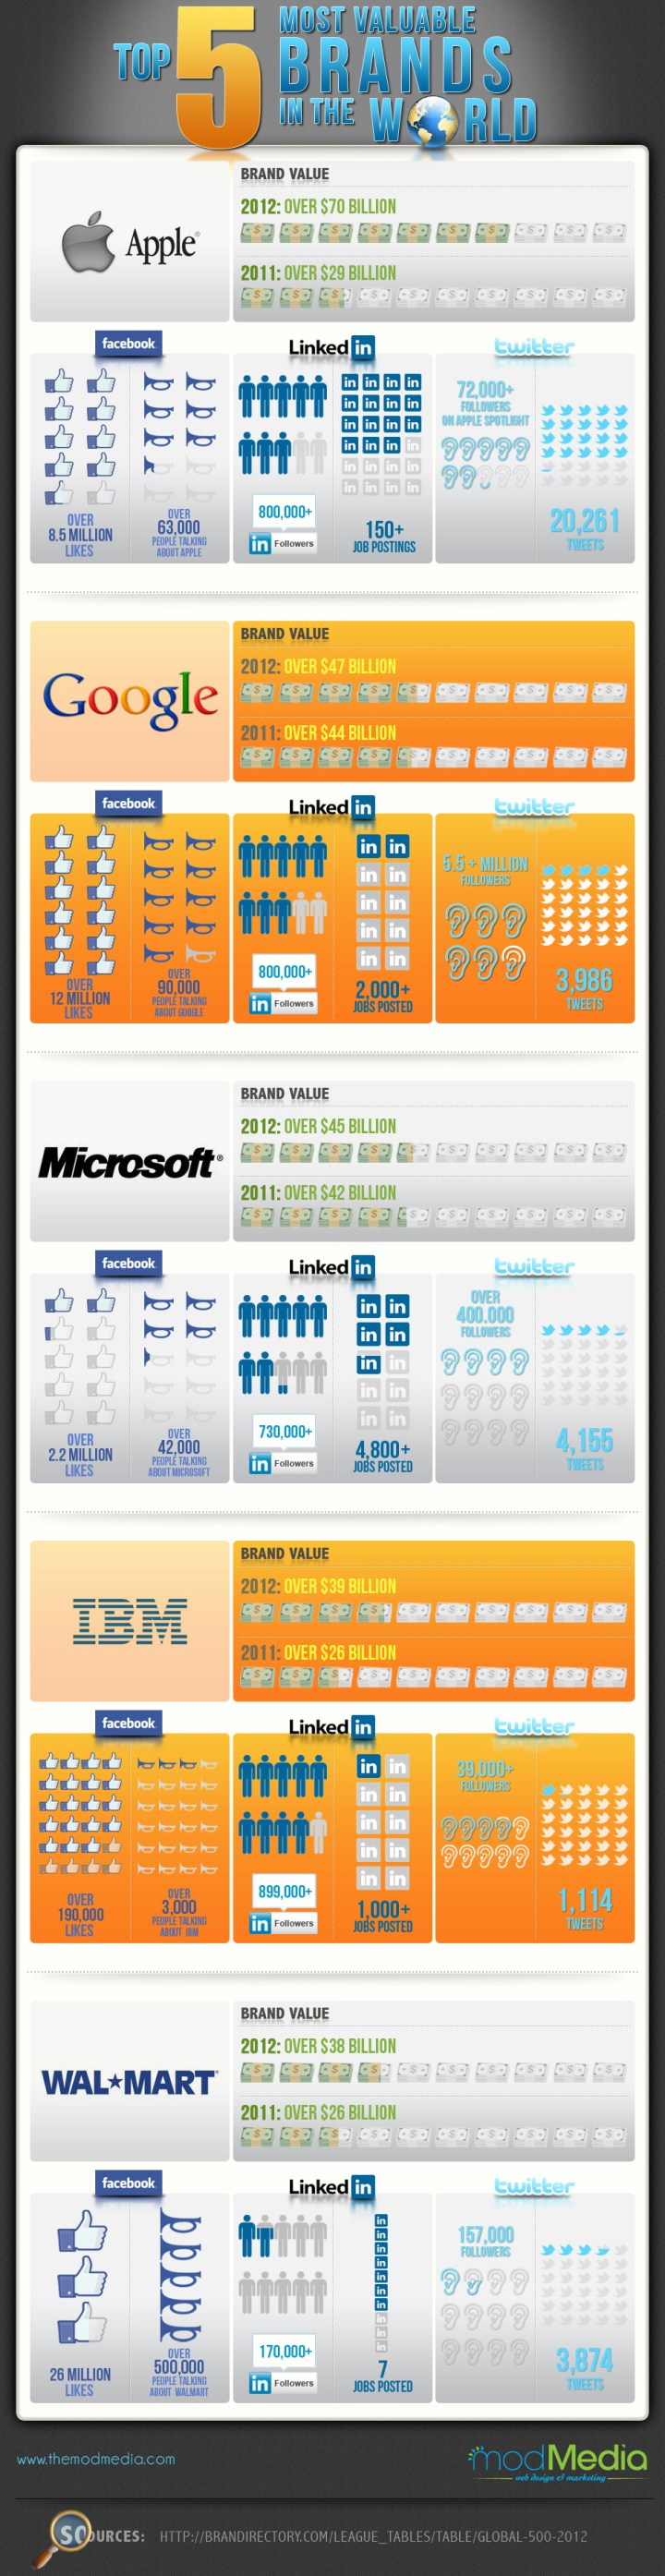 top-brands-world